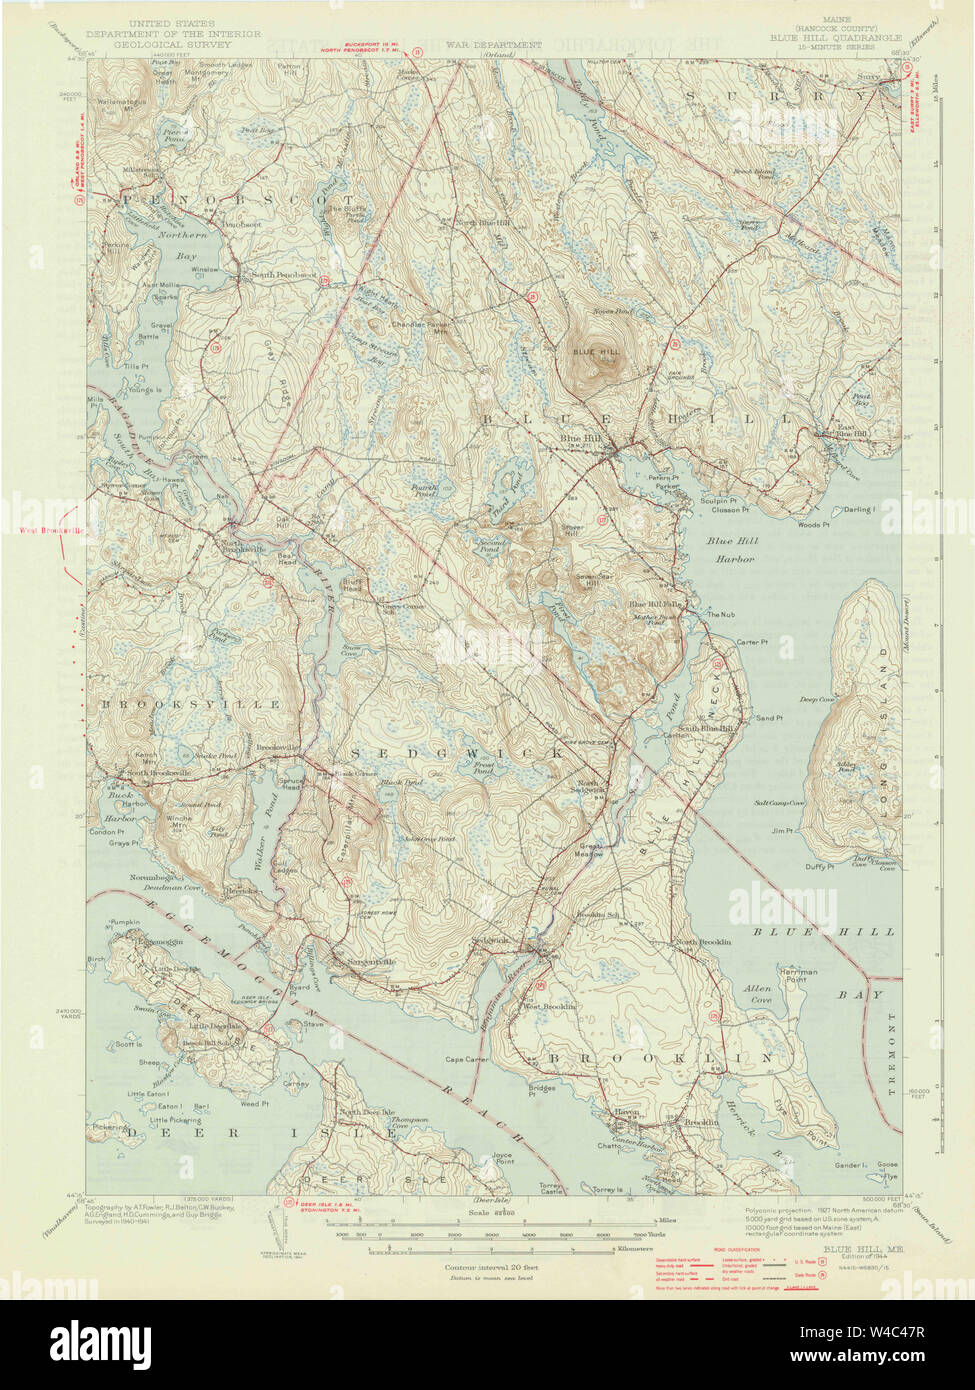 Maine Usgs Historical Map Blue Hill 306477 1944 62500 Restoration